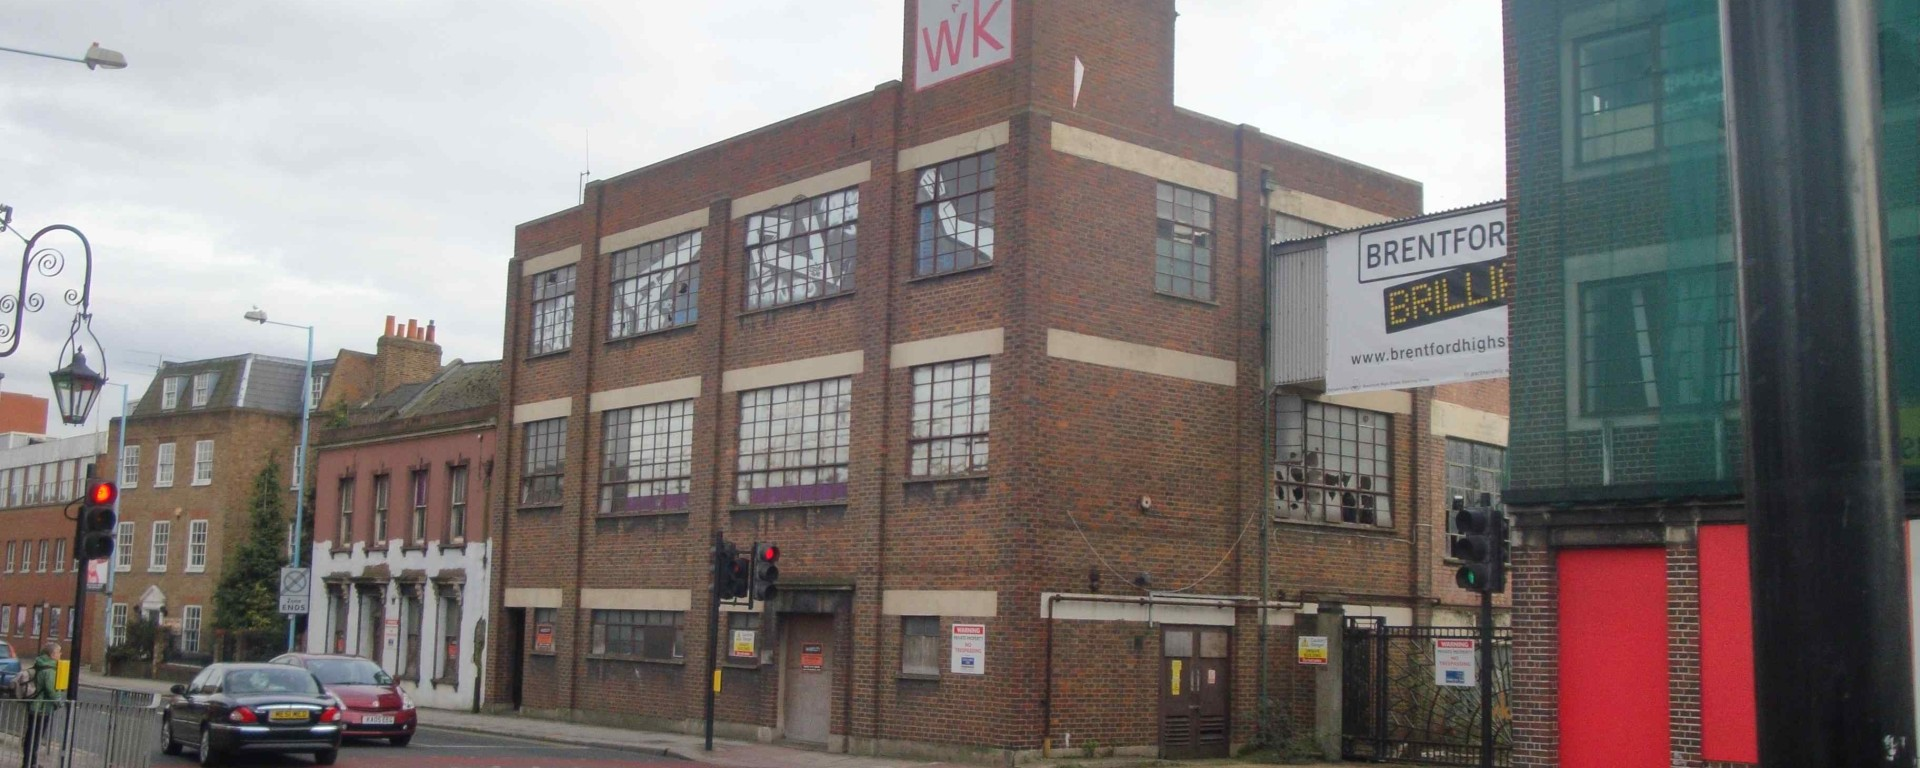 Wilson & Kyle Building